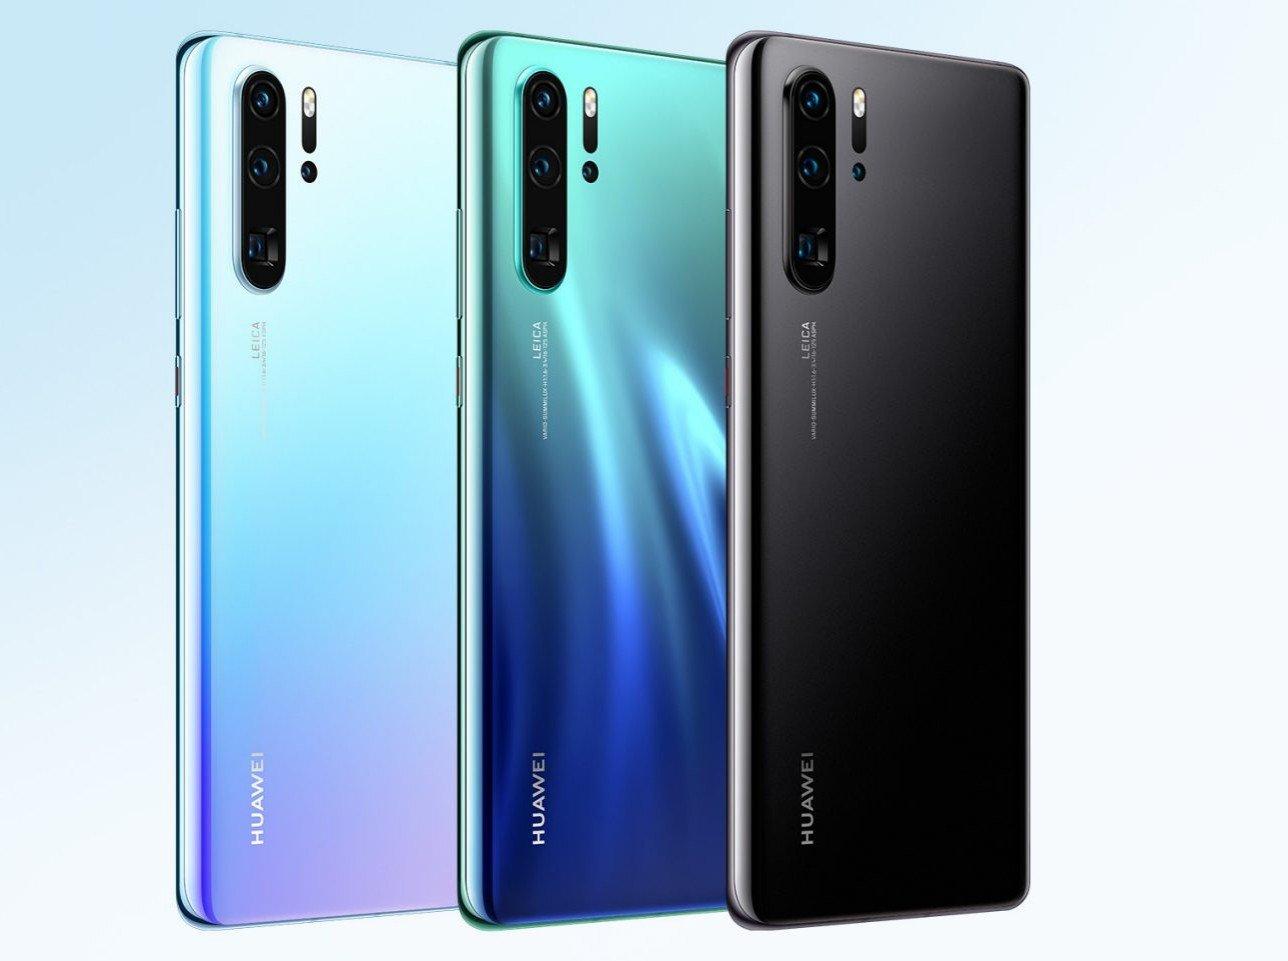 Huawei P30 Pro Edited